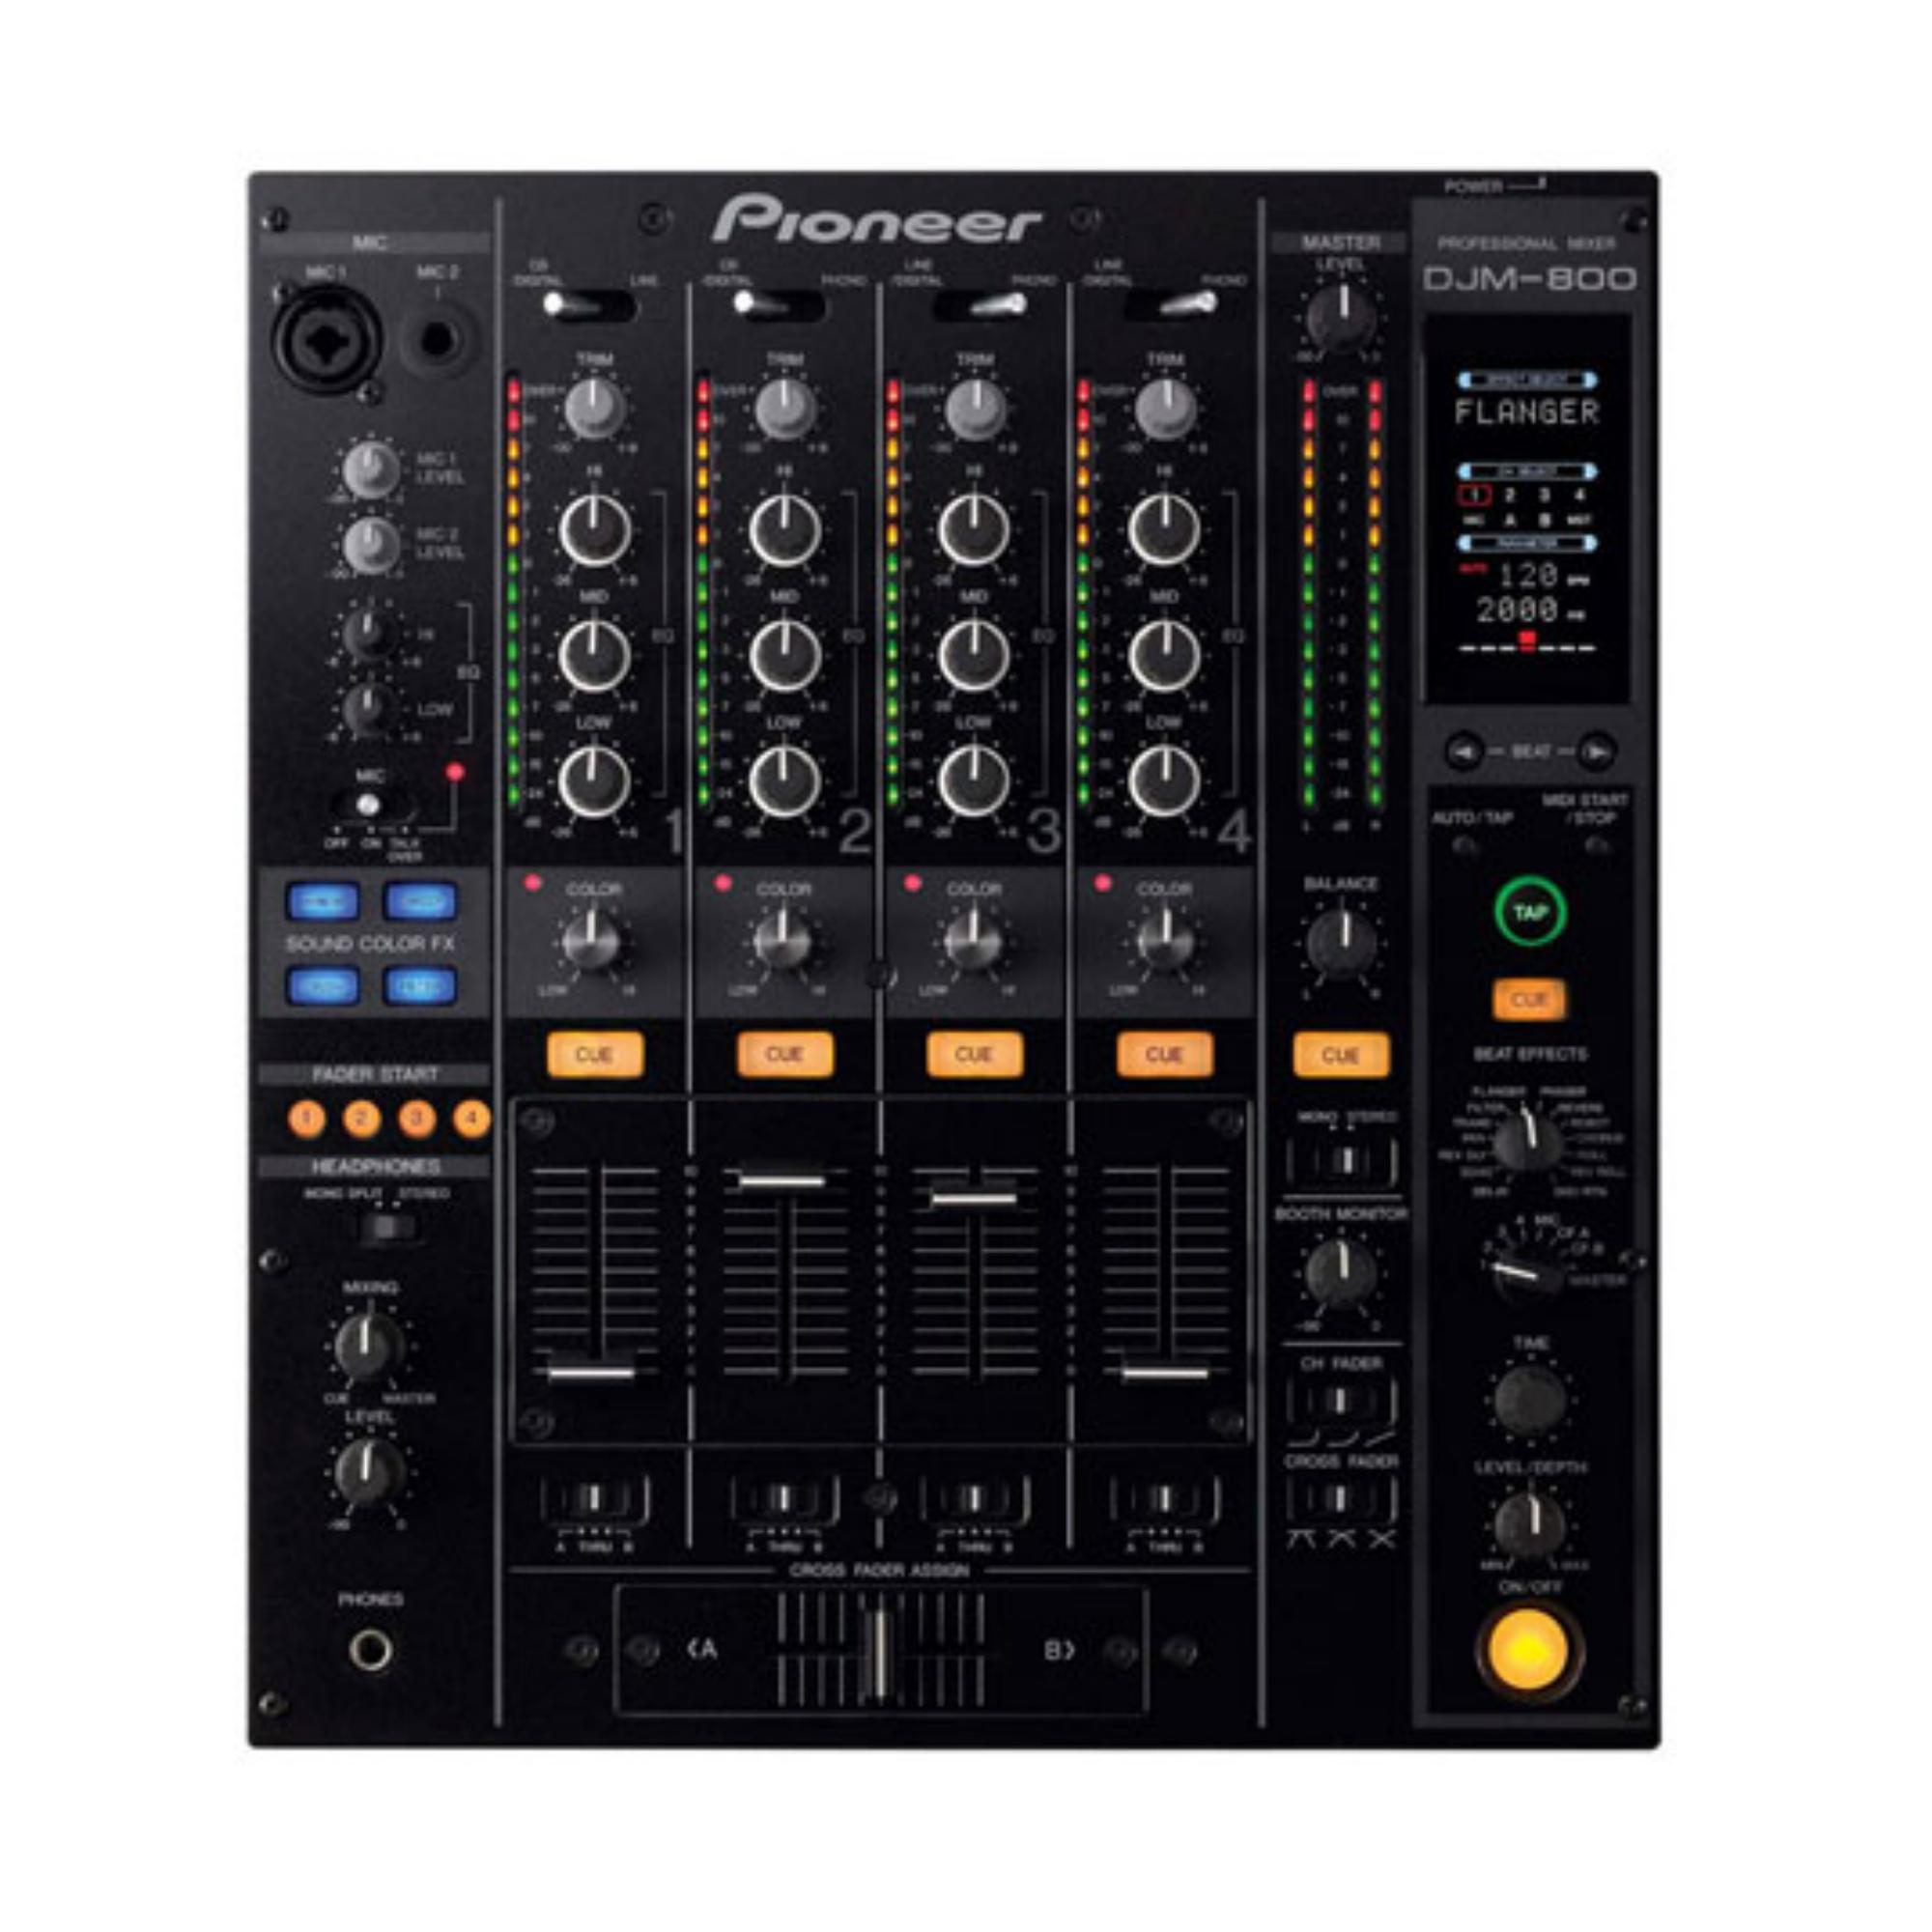 rent-pioneer-djm-800-nexus.jpg